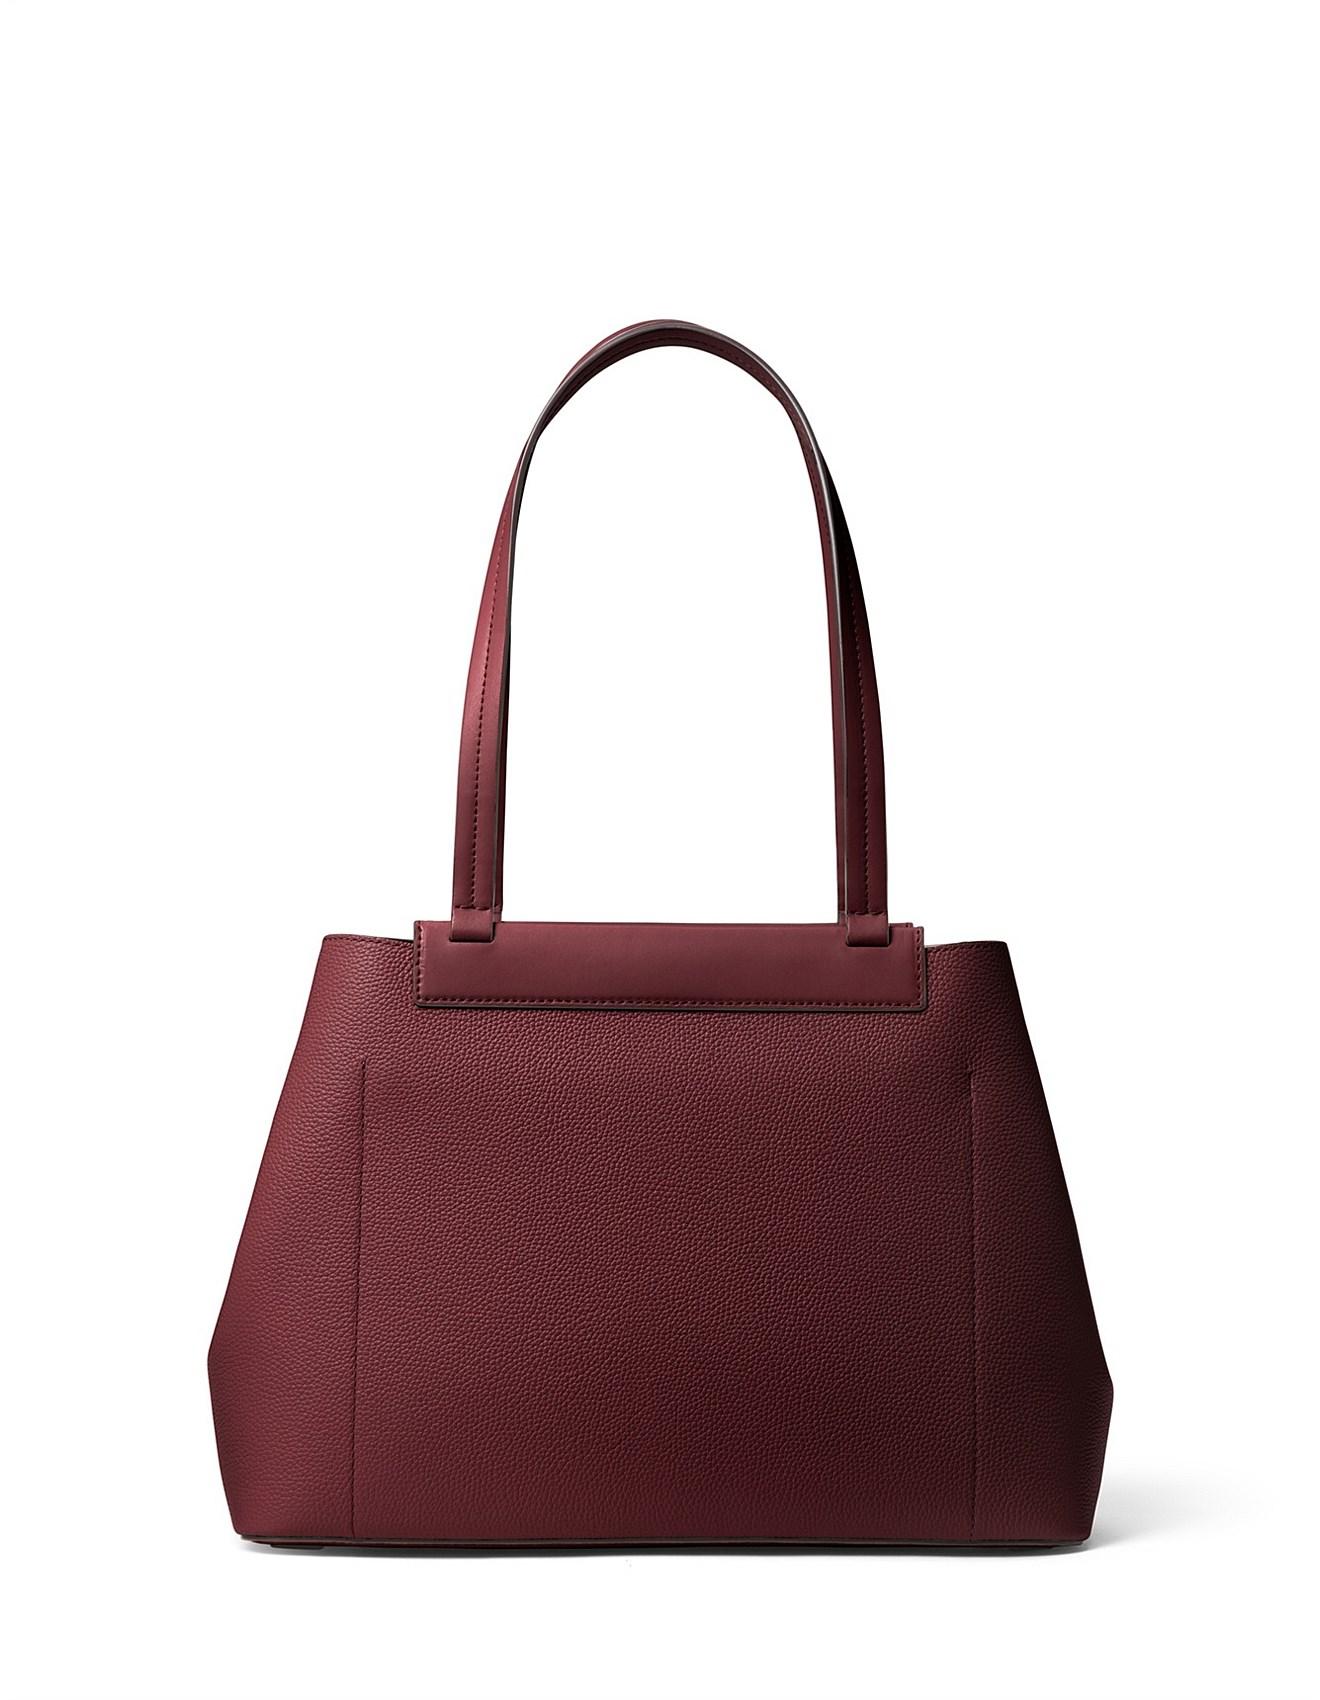 ab793fbf39c7 Women's Shoulder Bags Sale | Handbags On Sale | David Jones ...